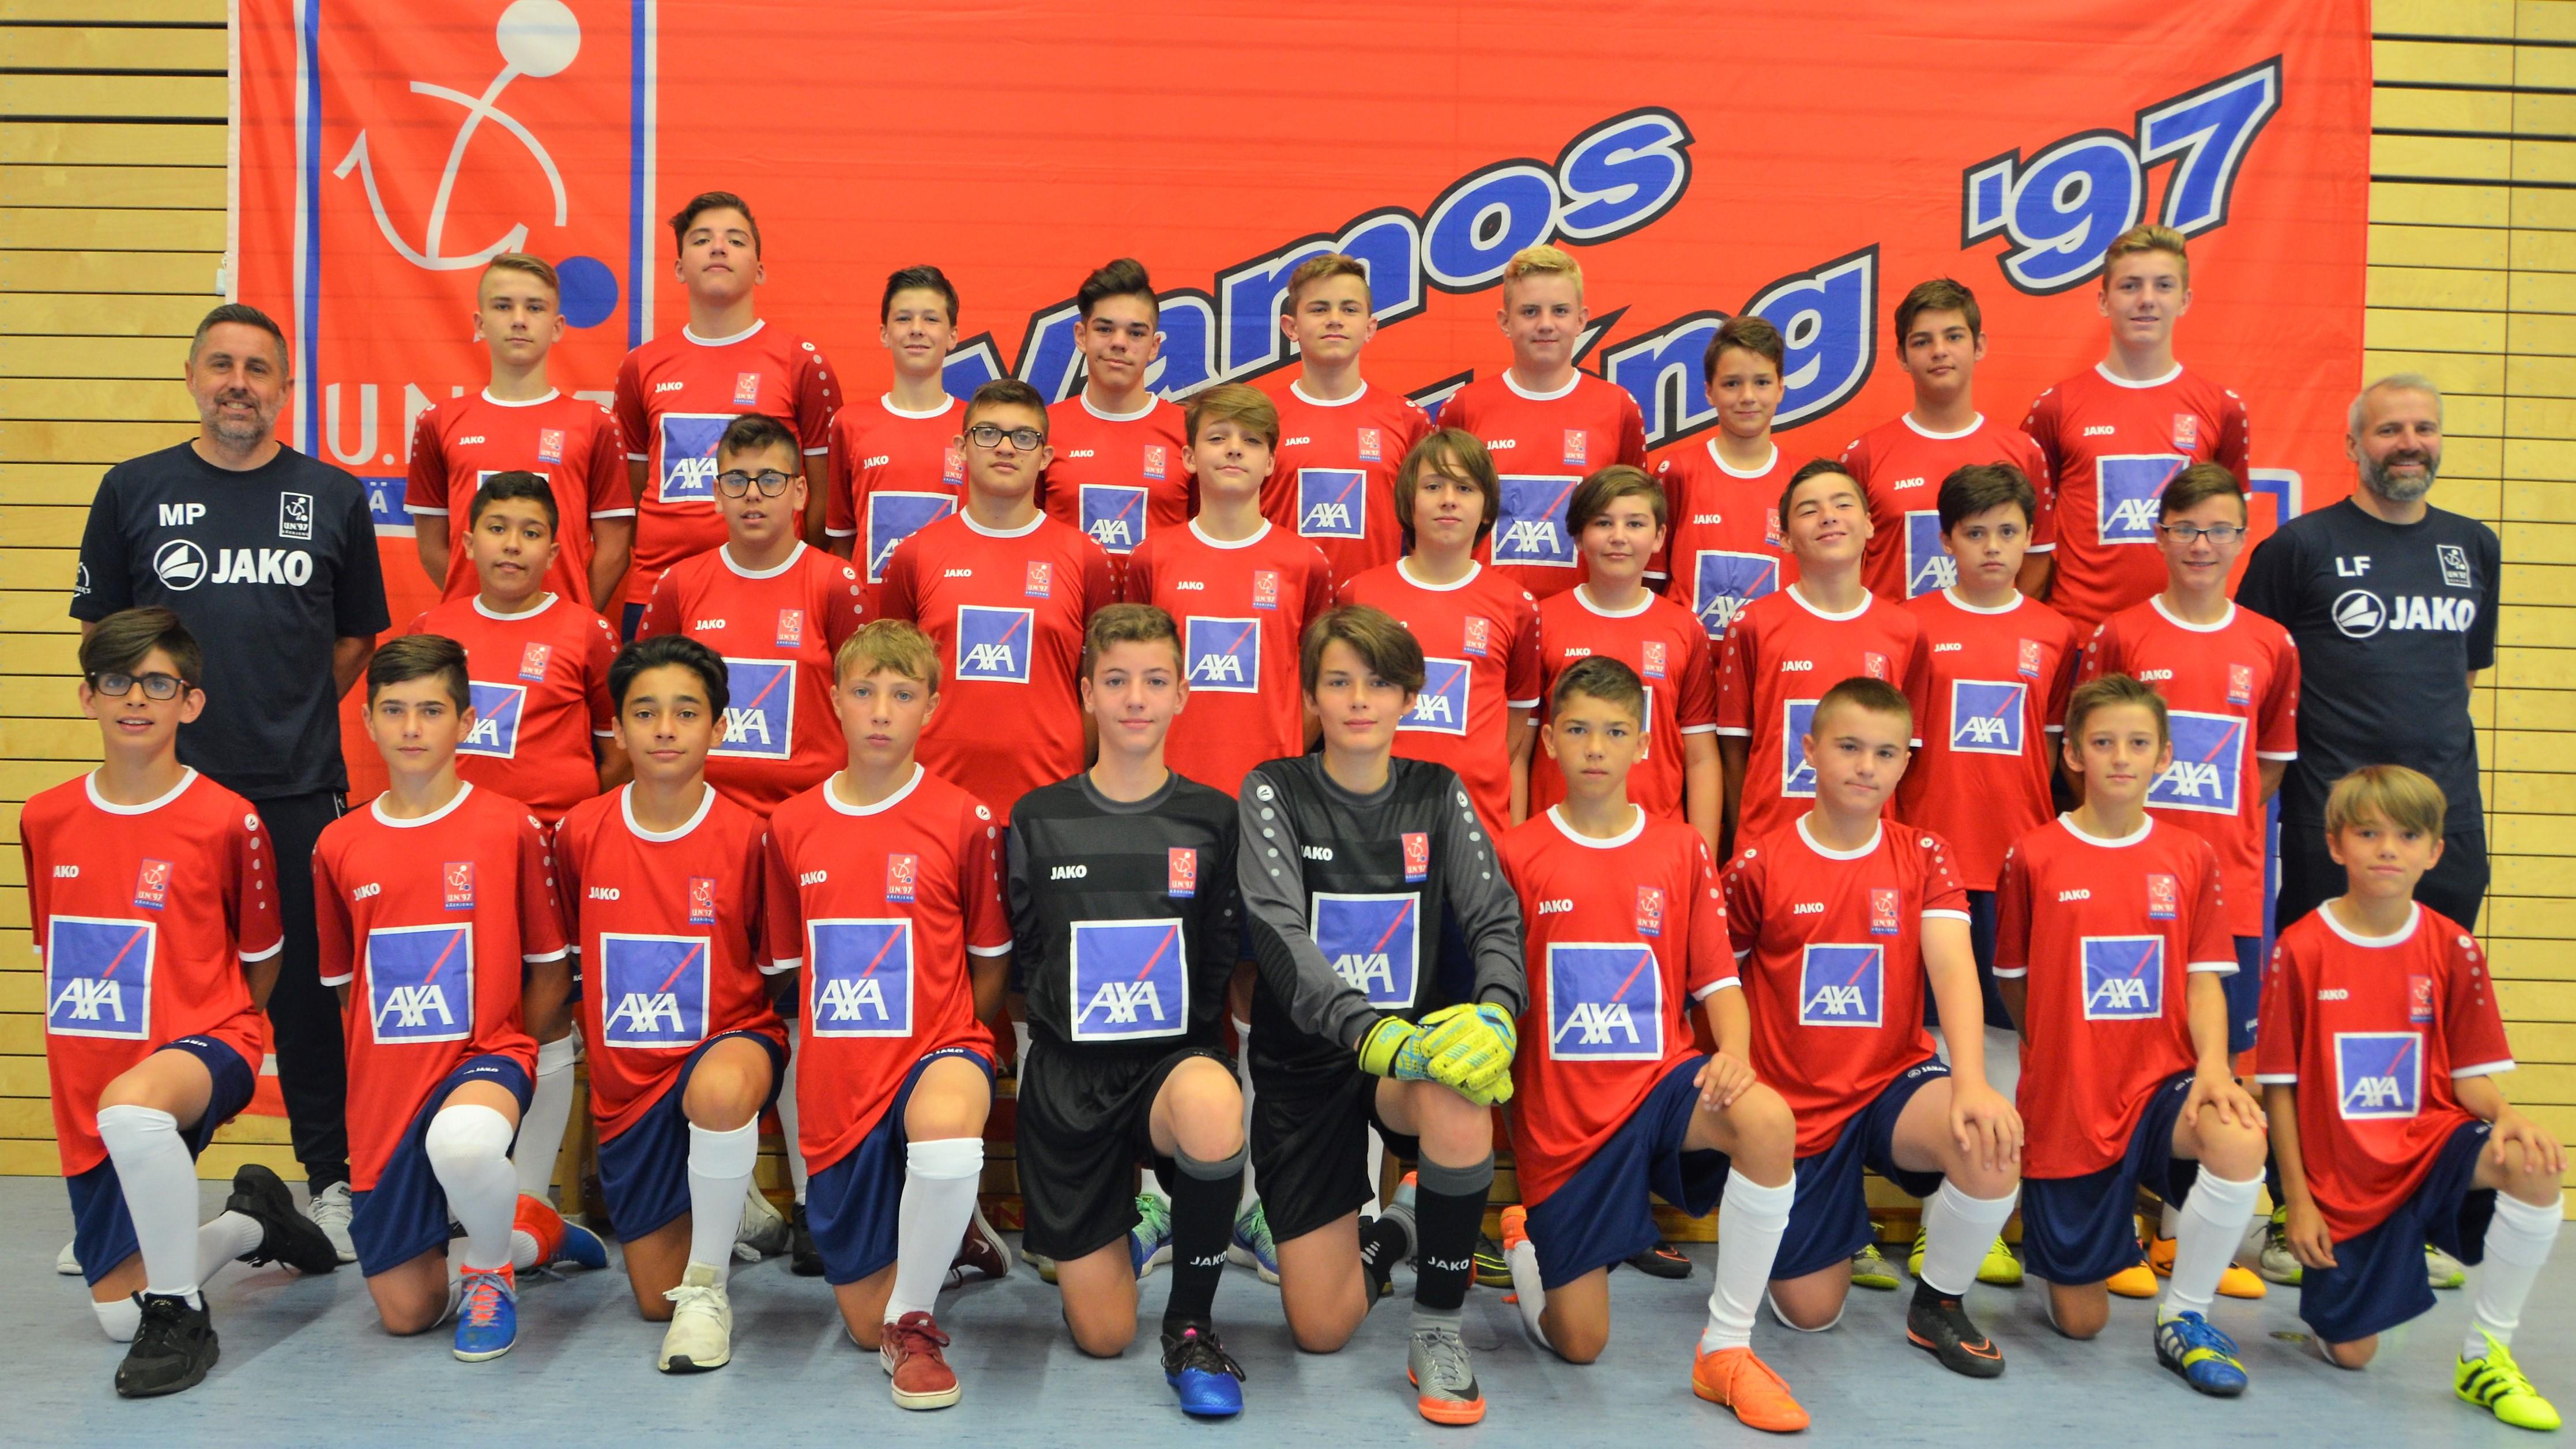 Halleffinale vum Futsal U9 um Dribbel